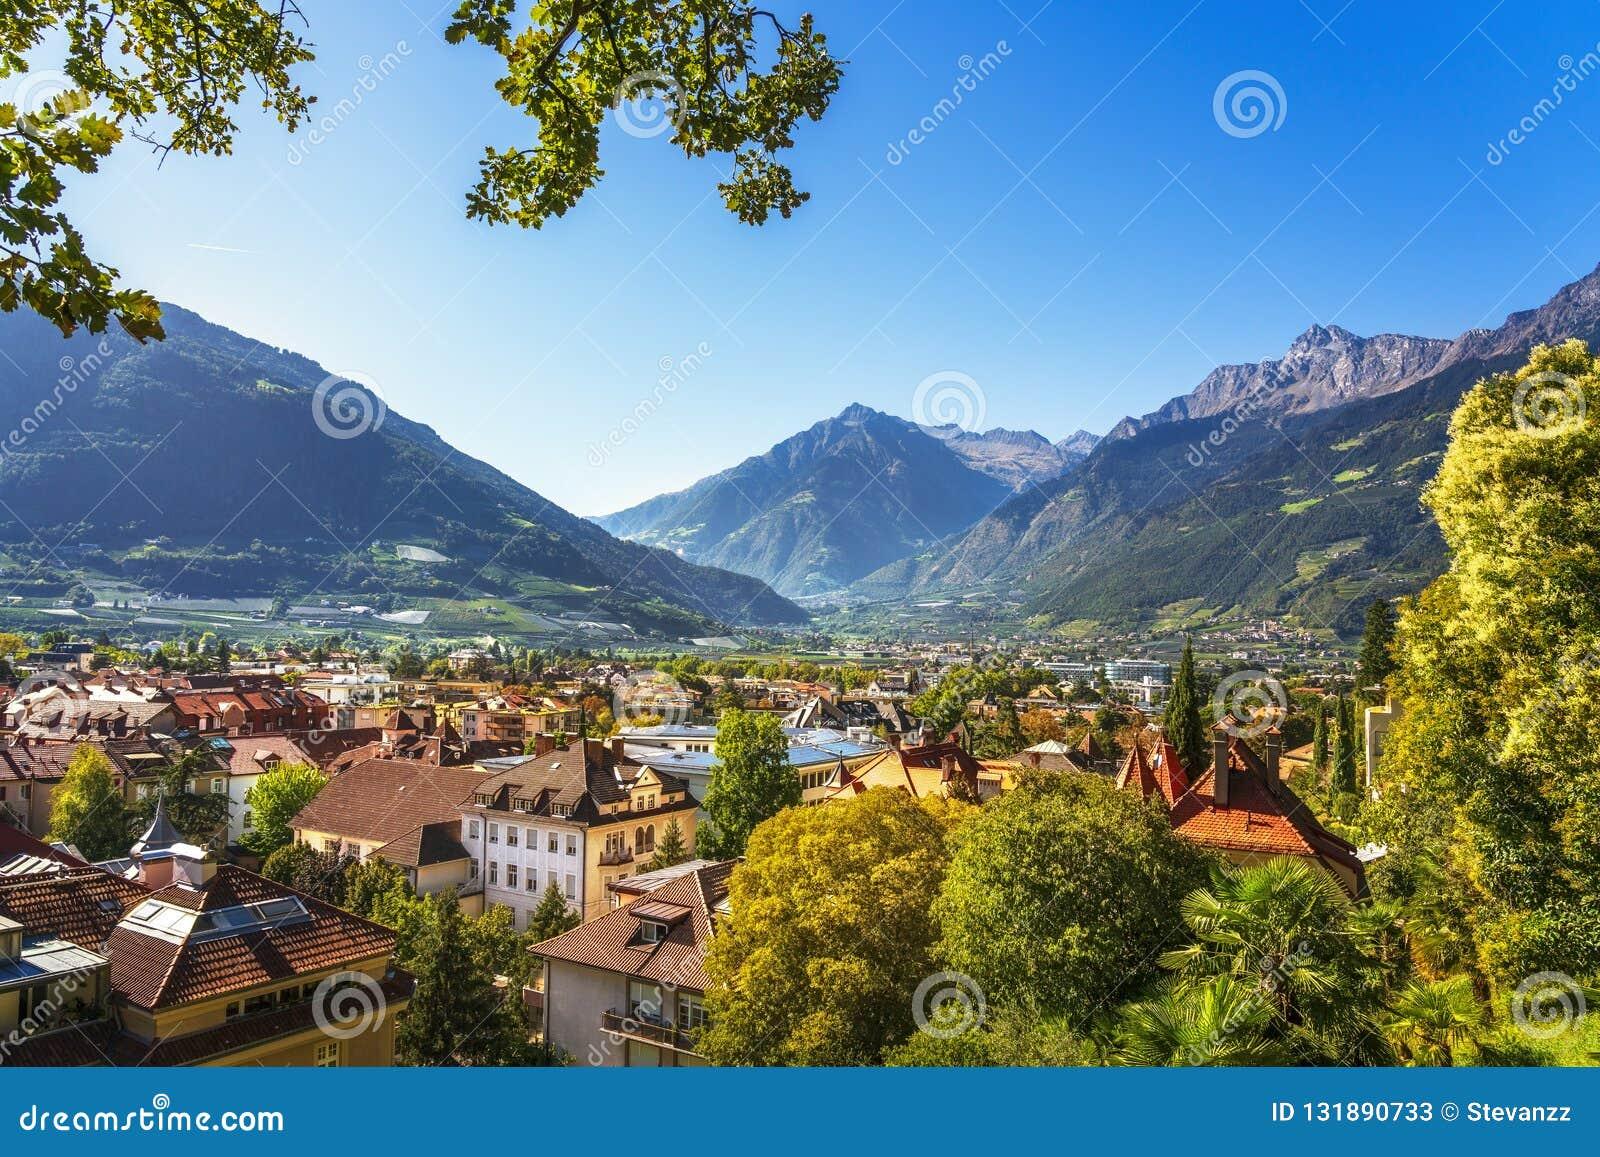 Merano or Meran view from Tappeiner promenade. Trentino Alto Adige Sud Tyrol, Italy.